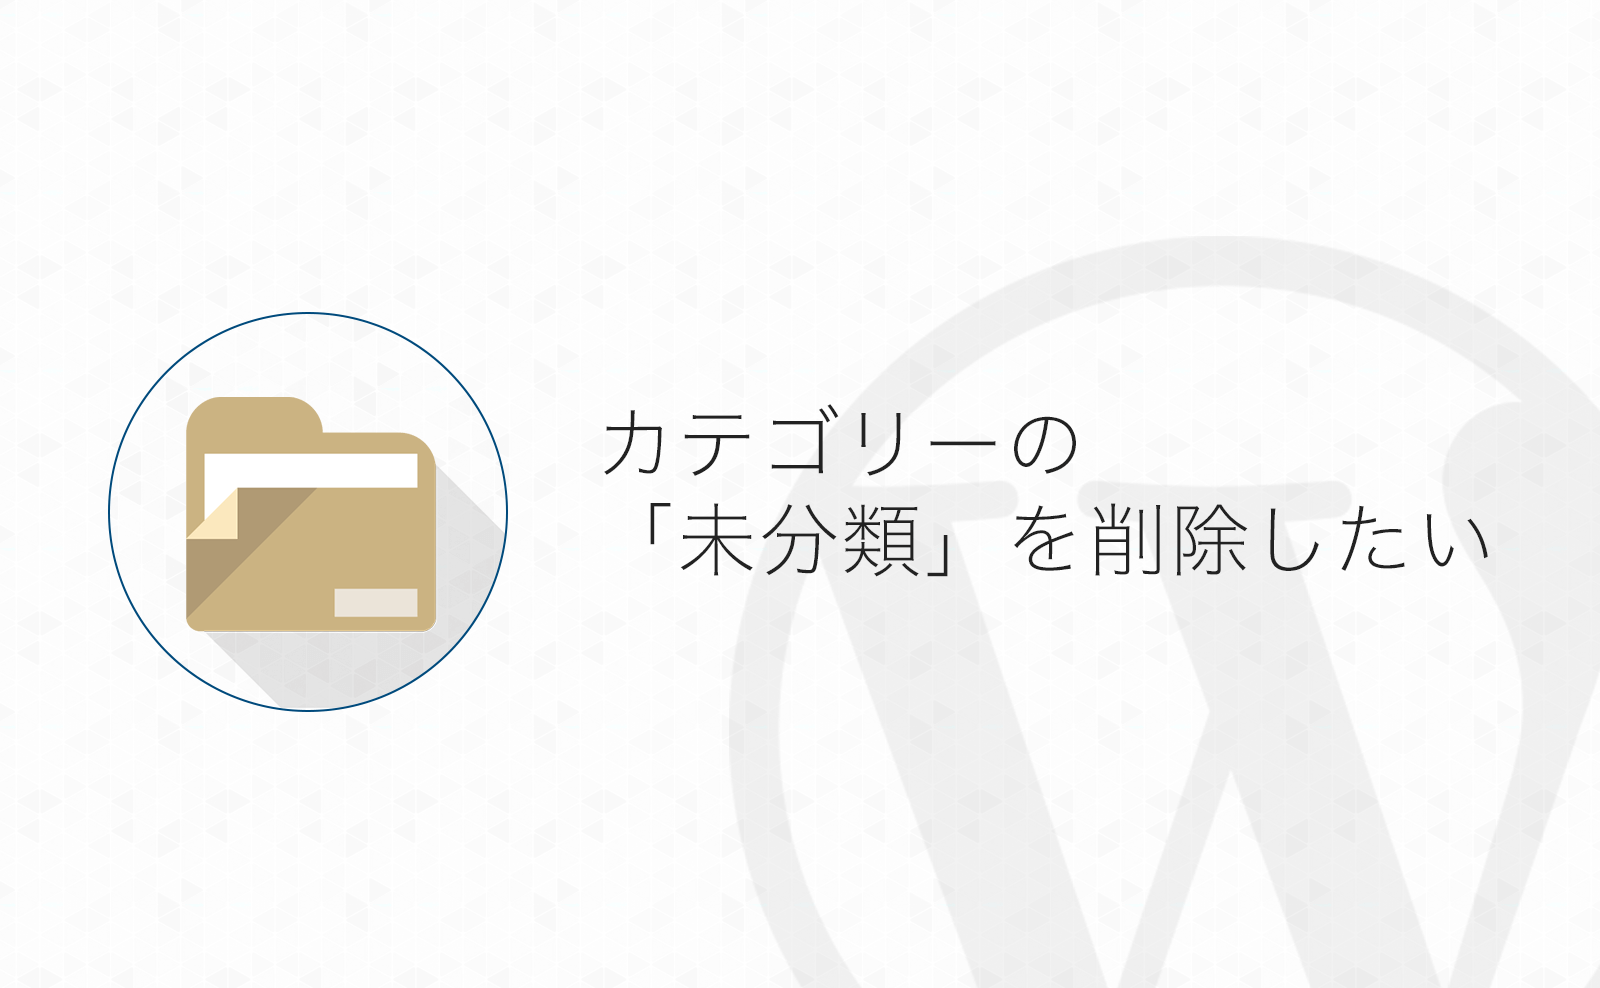 【WordPress】カテゴリーの「未分類」が削除できないときの対処方法